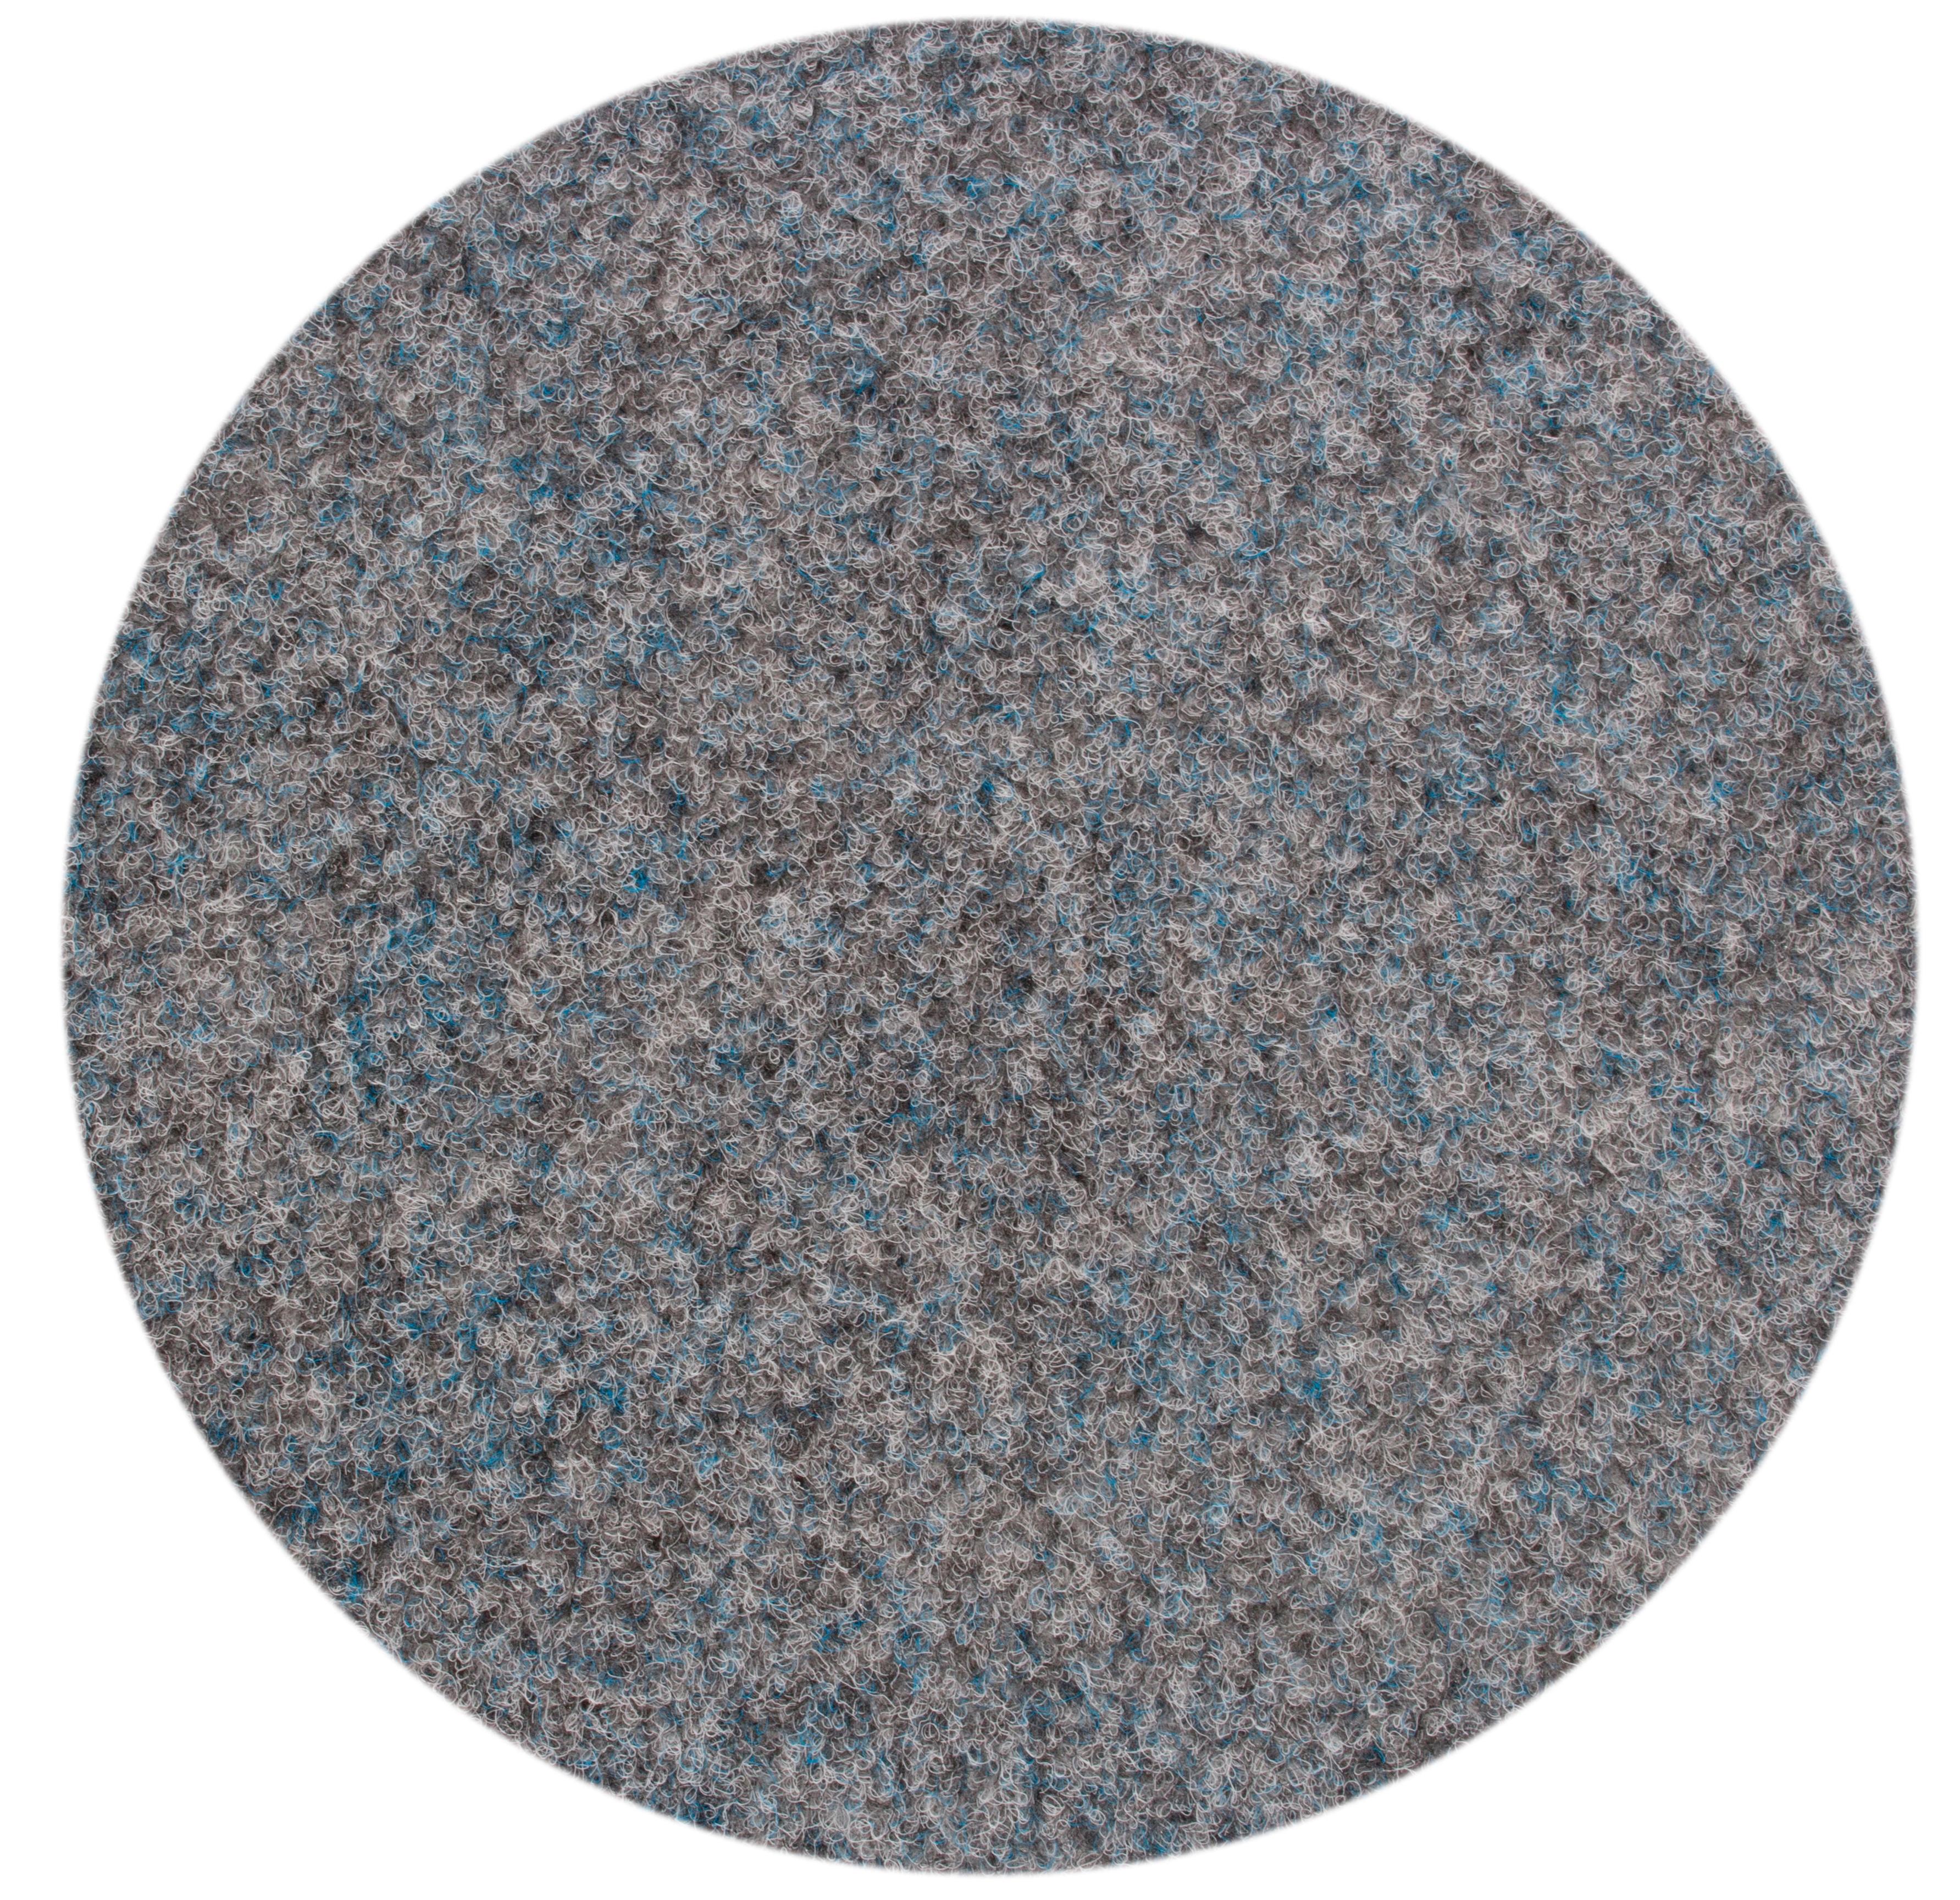 Andiamo Rasenteppich Field, rund, 4 mm Höhe grau Outdoor-Teppiche Teppiche